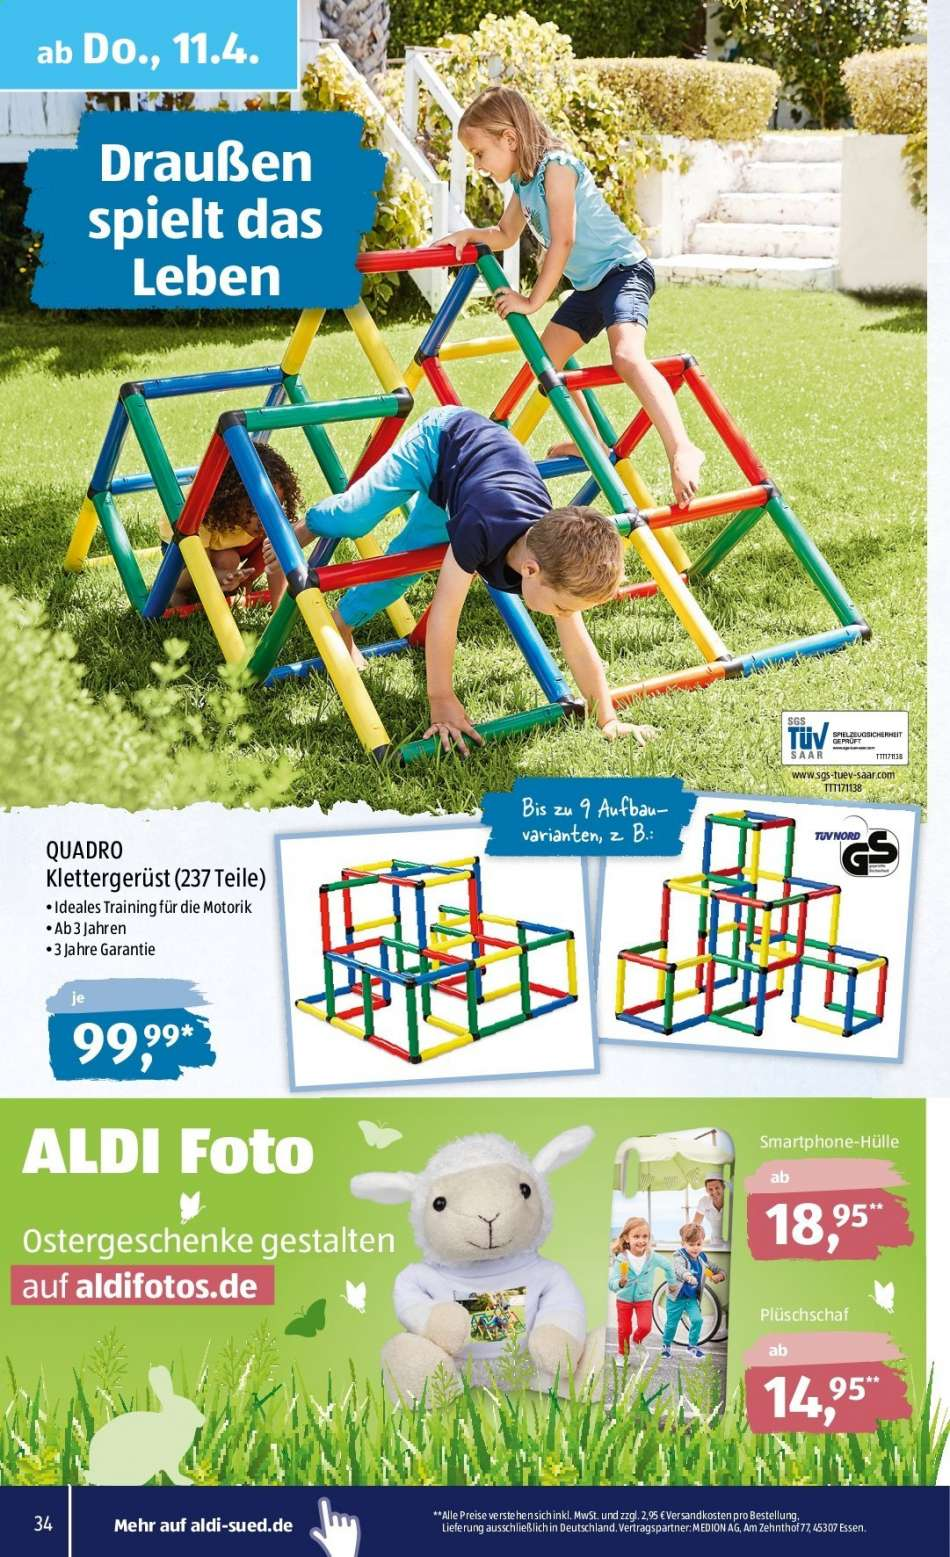 Full Size of Quadro Klettergerüst Aldi Sd Aktuelles Prospekt 842019 1342019 Rabatt Kompass Garten Wohnzimmer Quadro Klettergerüst